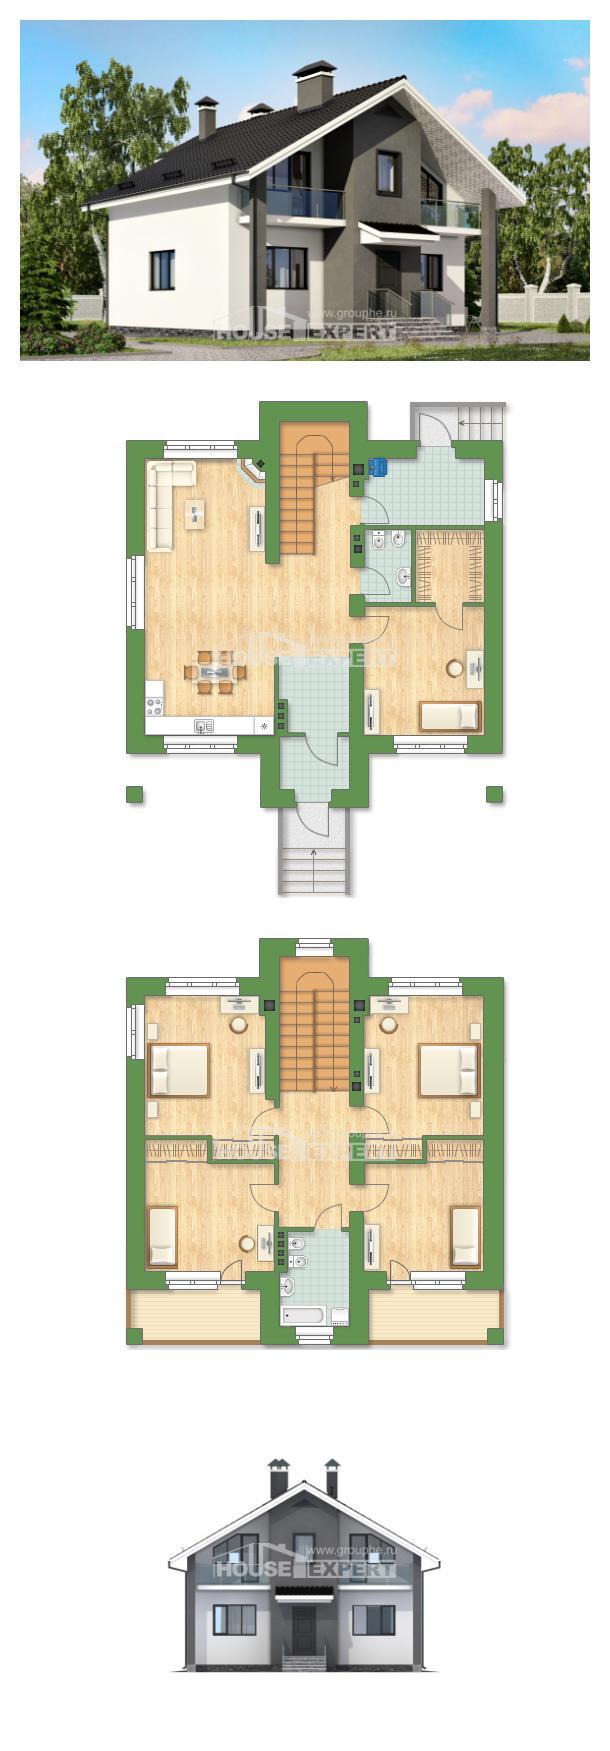 Projekt domu 150-005-L | House Expert